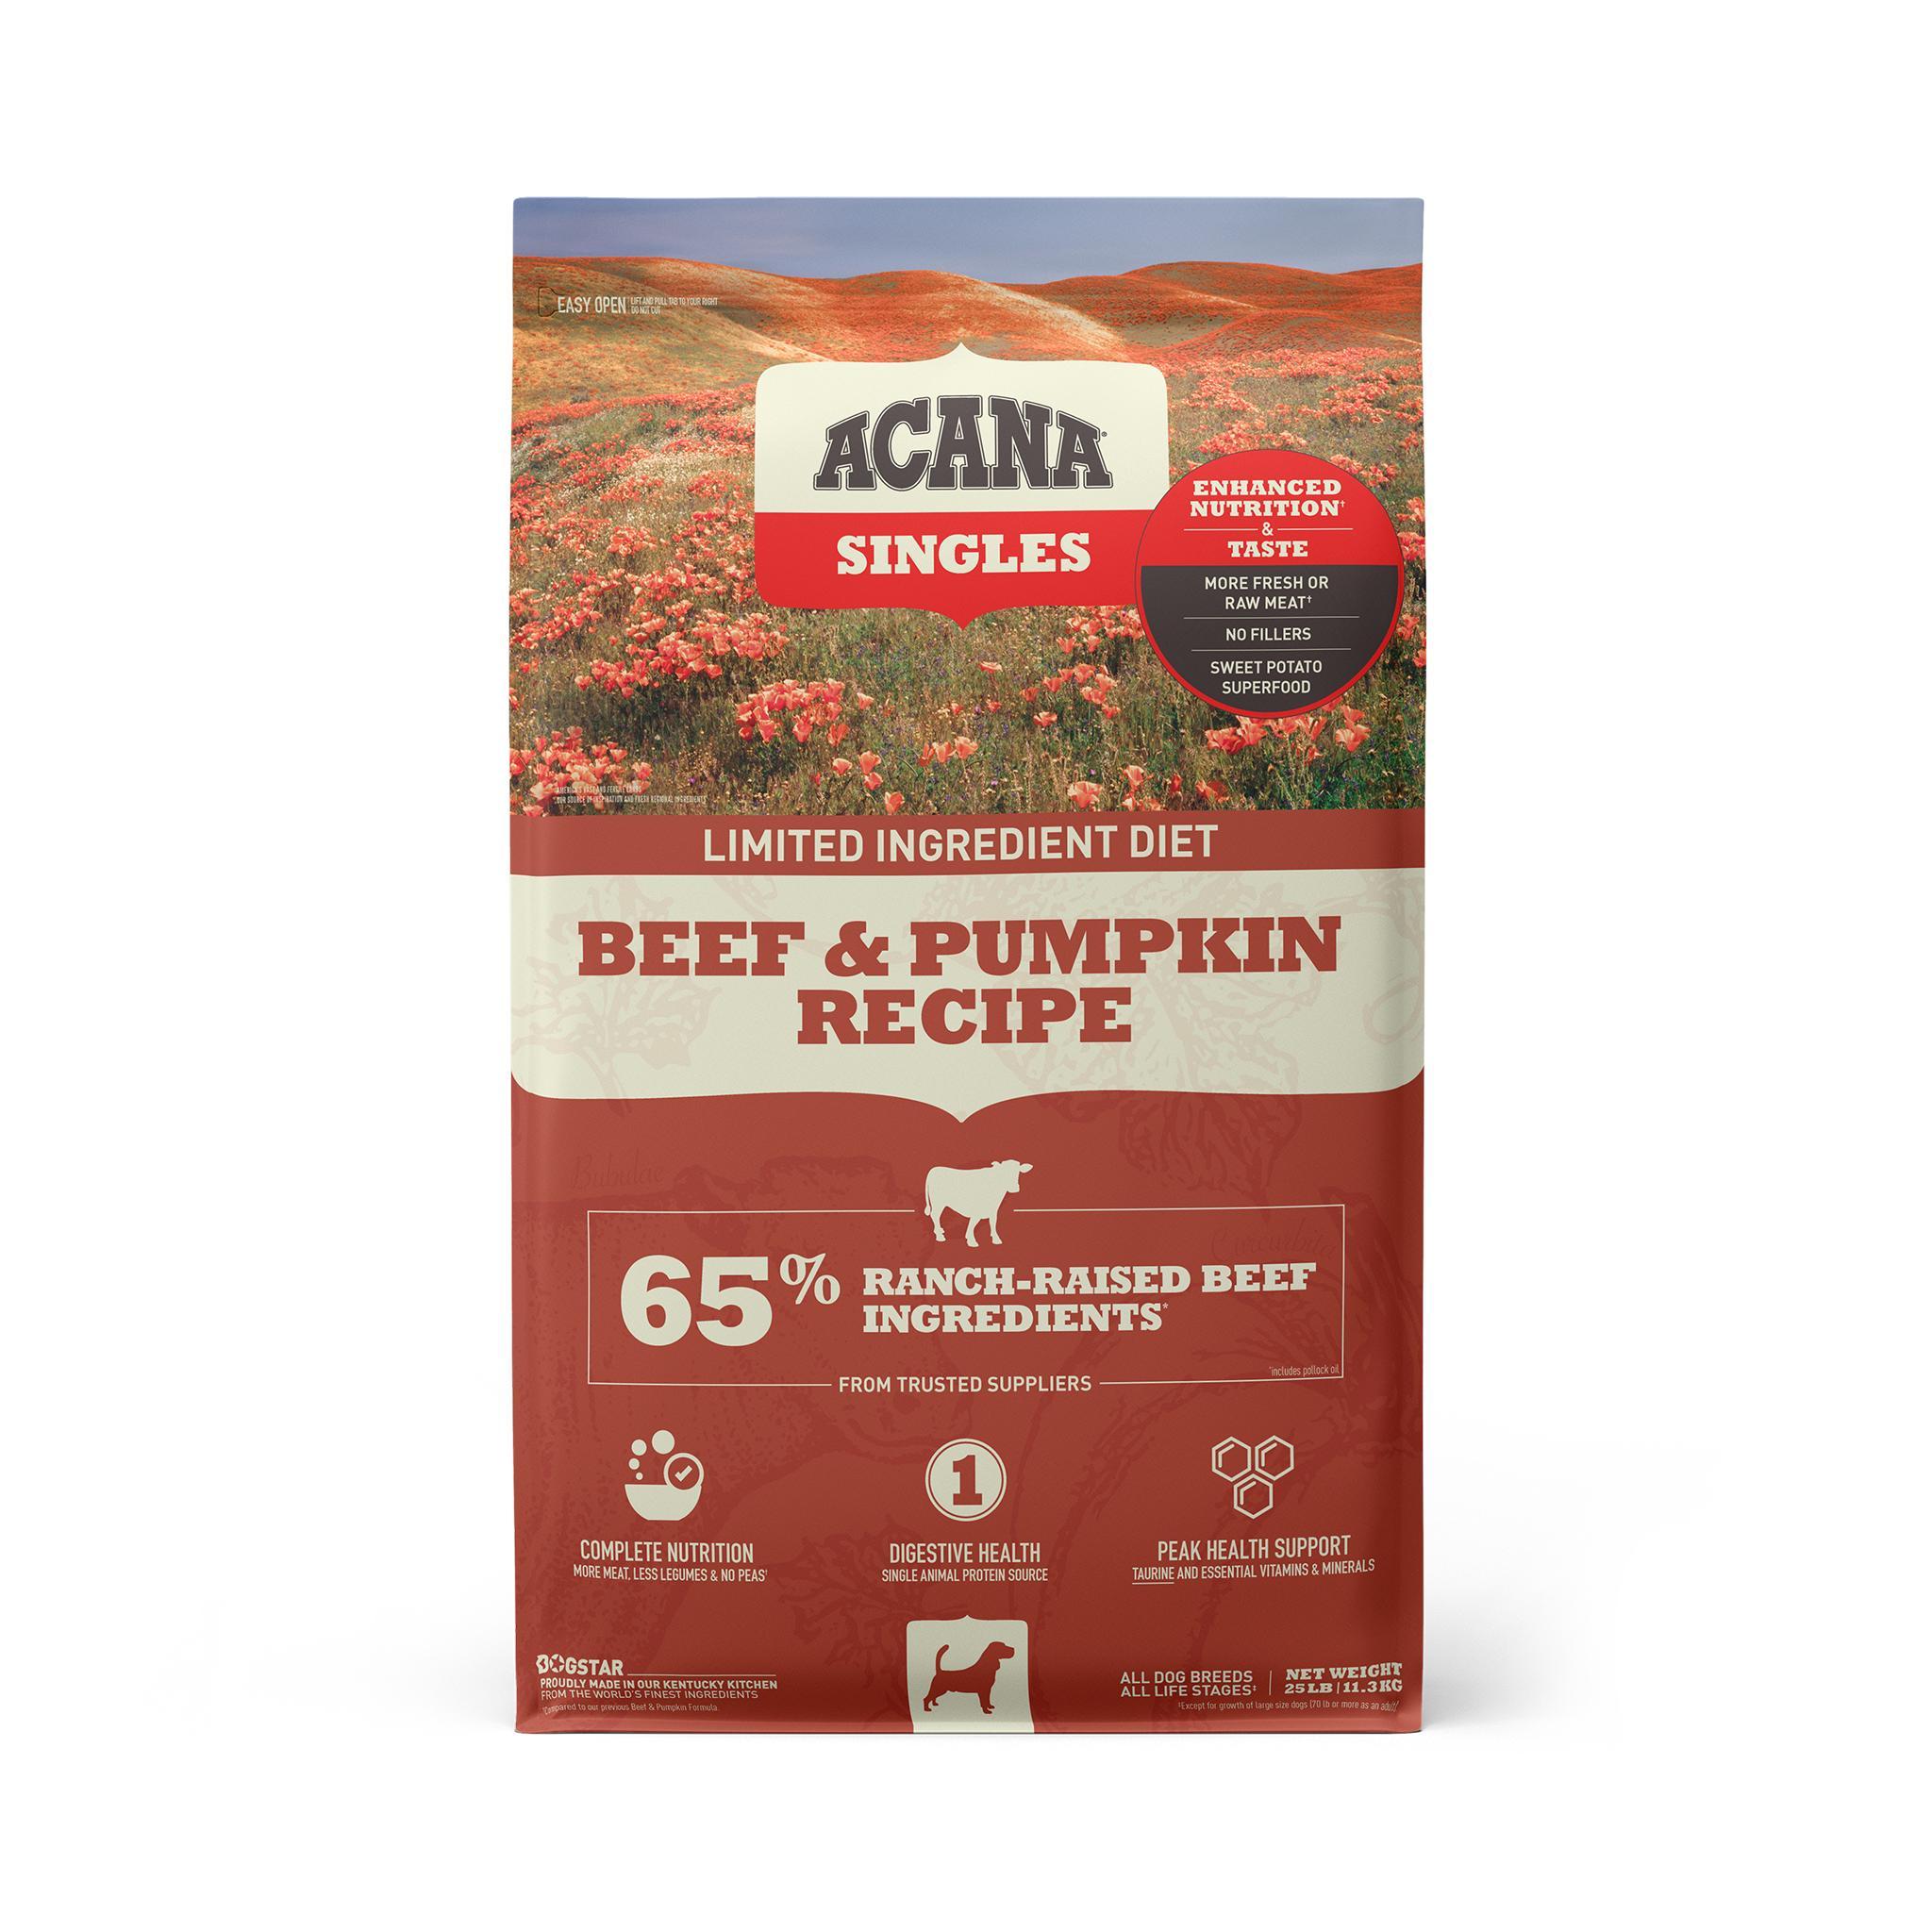 ACANA Singles Limited Ingredient Beef & Pumpkin Grain-Free Dry Dog Food, 25-lb